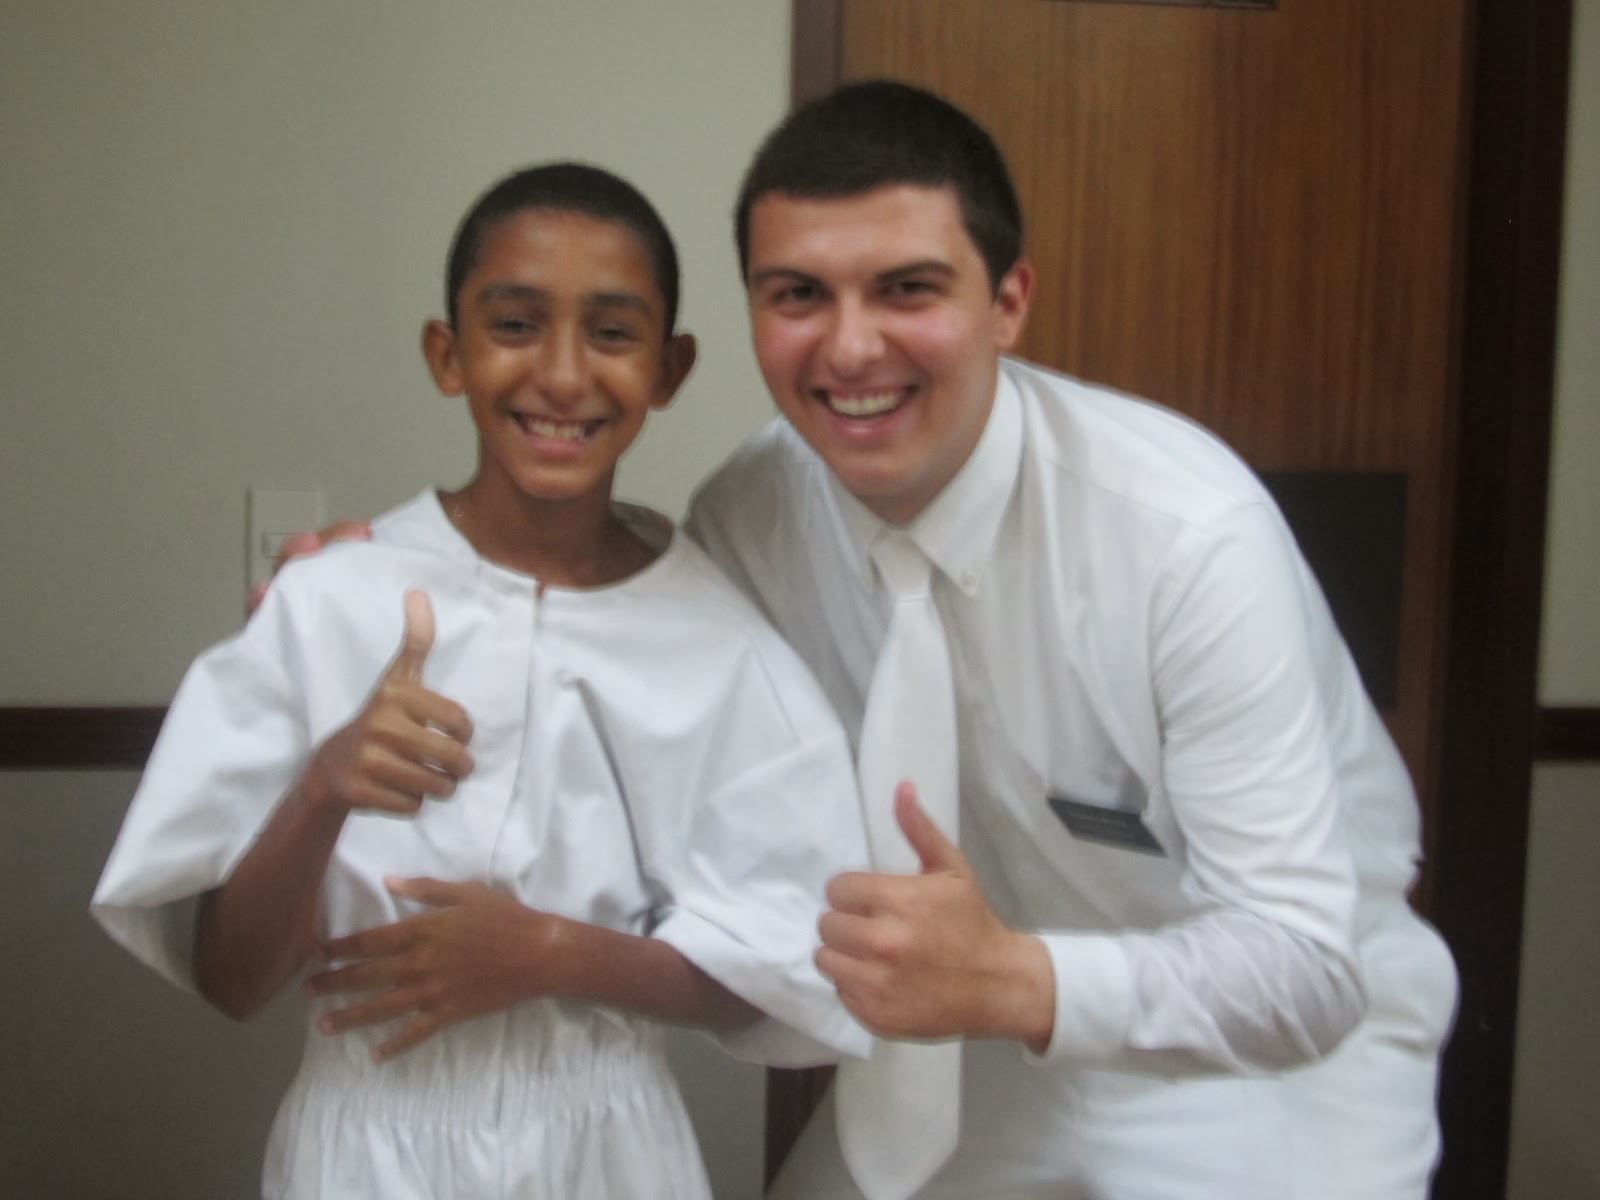 BAPTISM -- Sep. 11, 2013